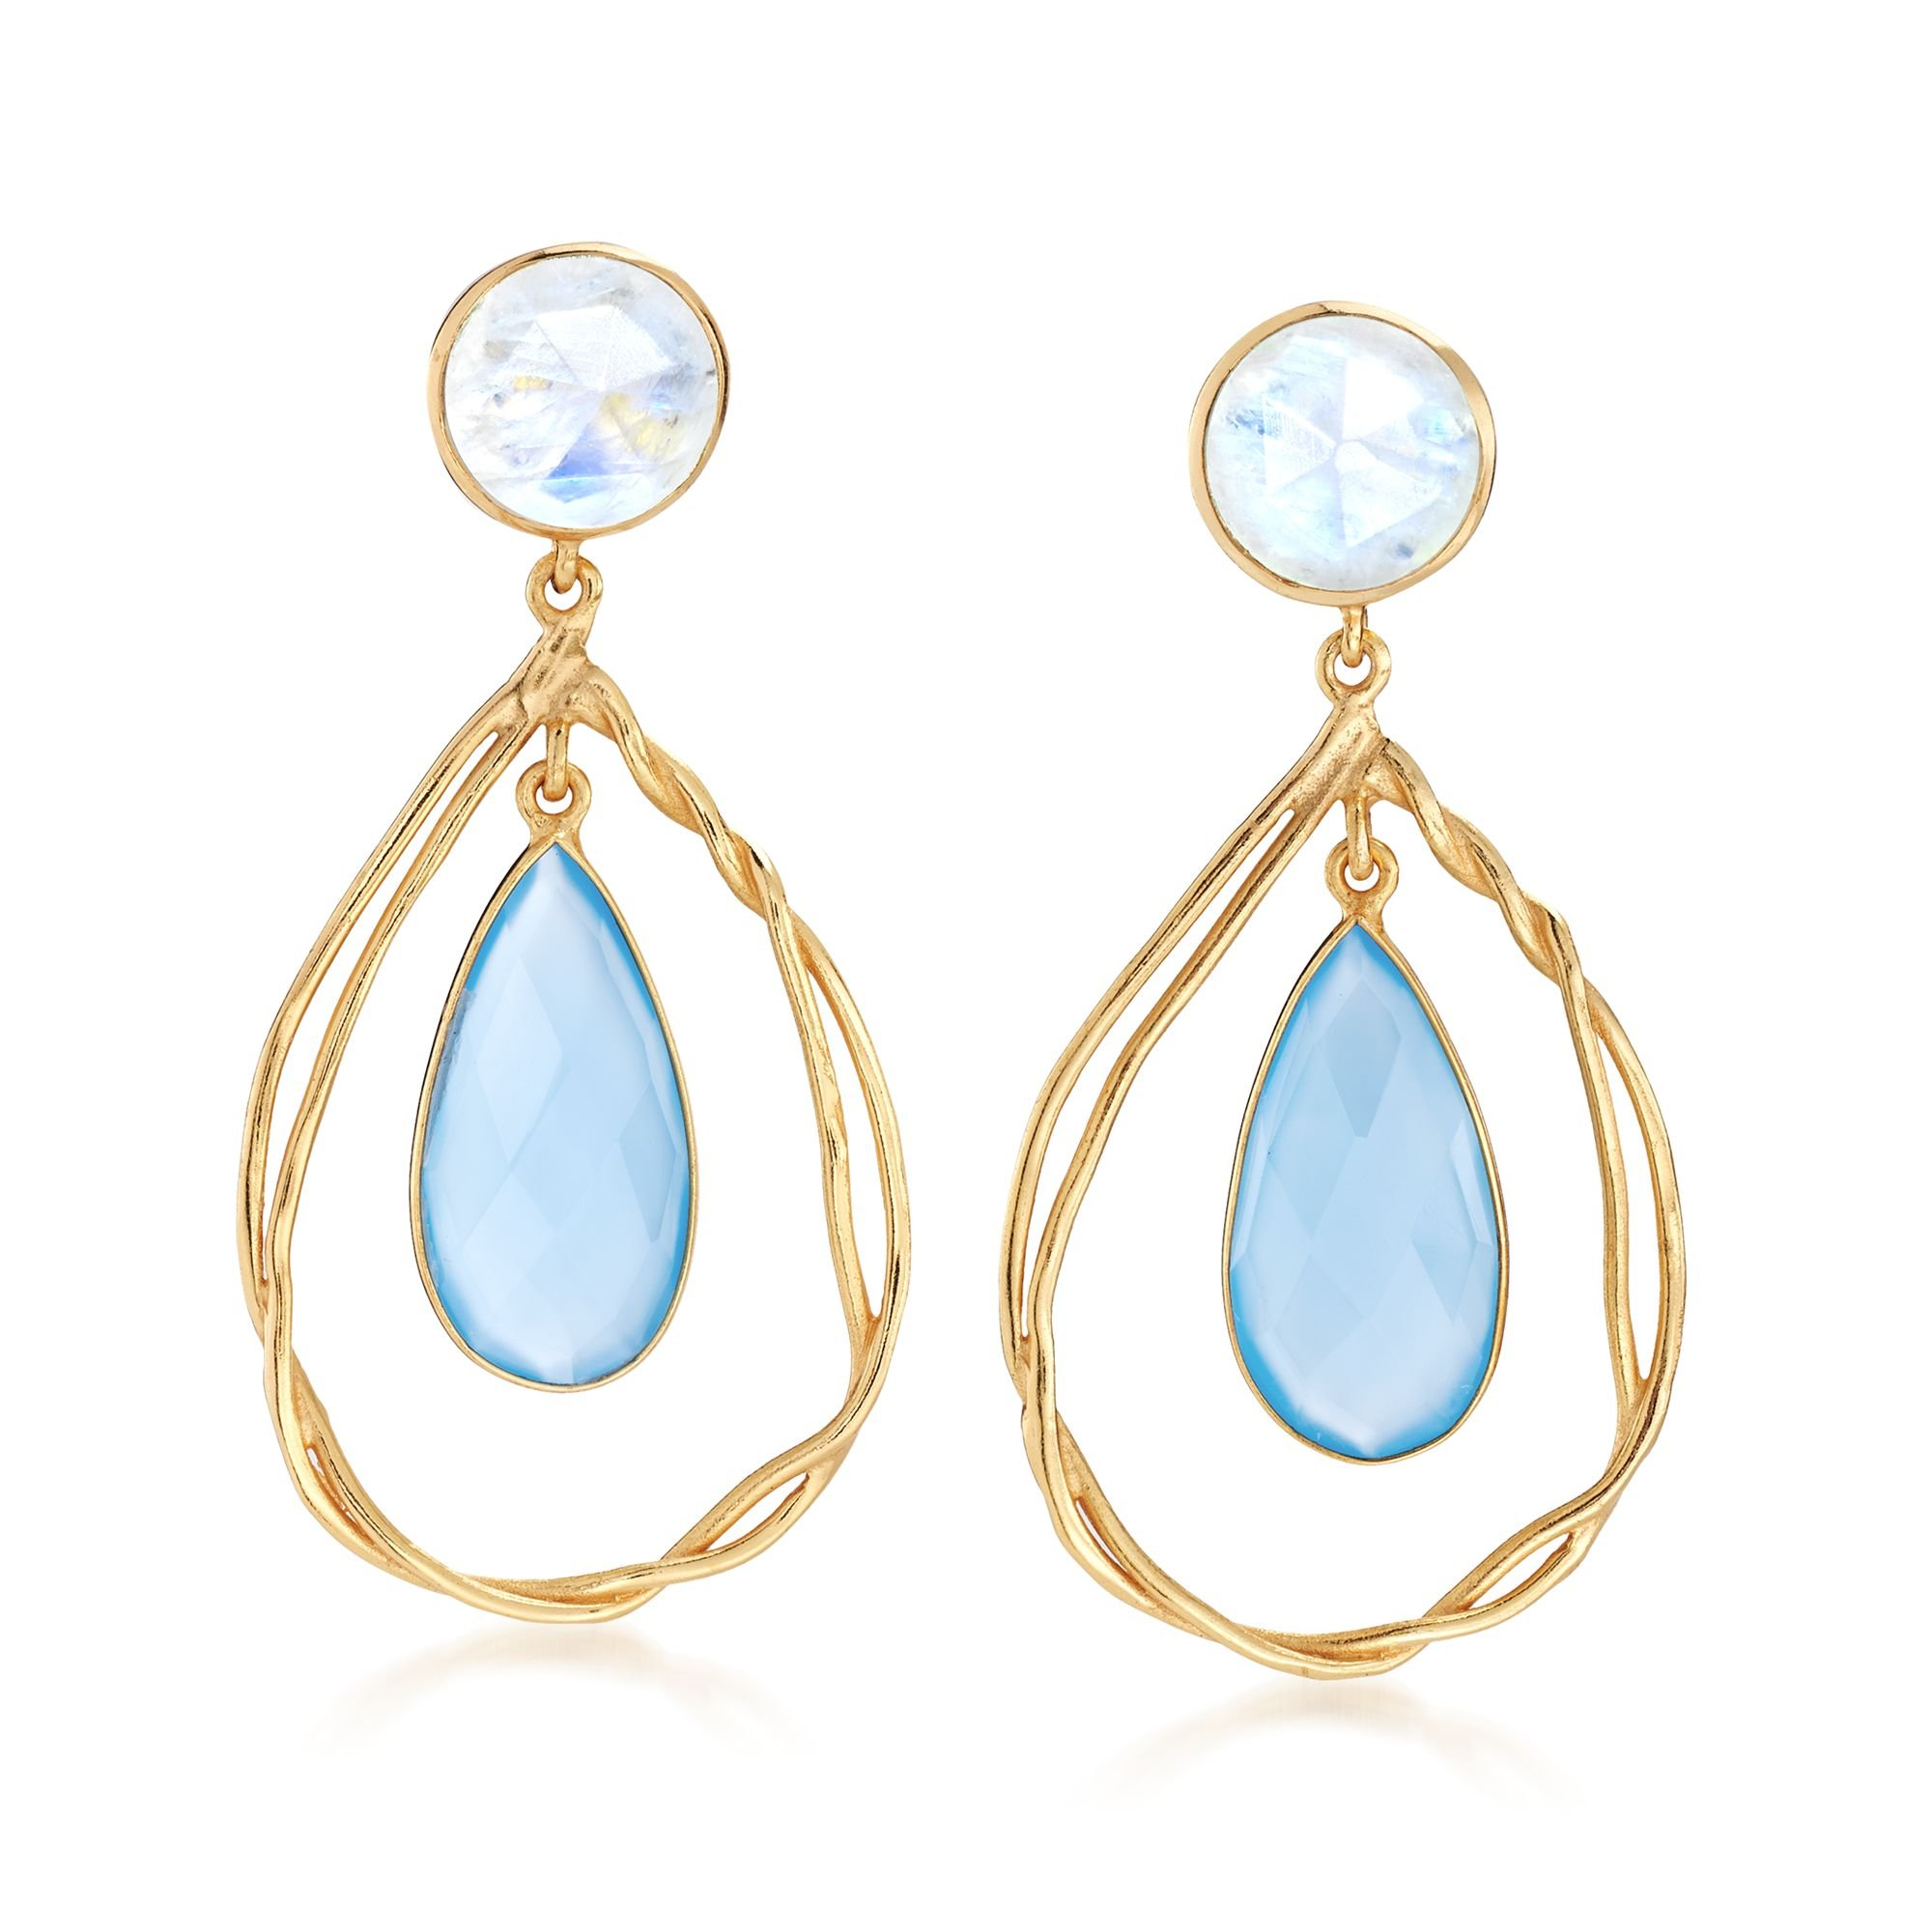 Ross-Simons Blue Chalcedony and Moonstone Open Teardrop Earrings in 18kt Gold Over Sterling